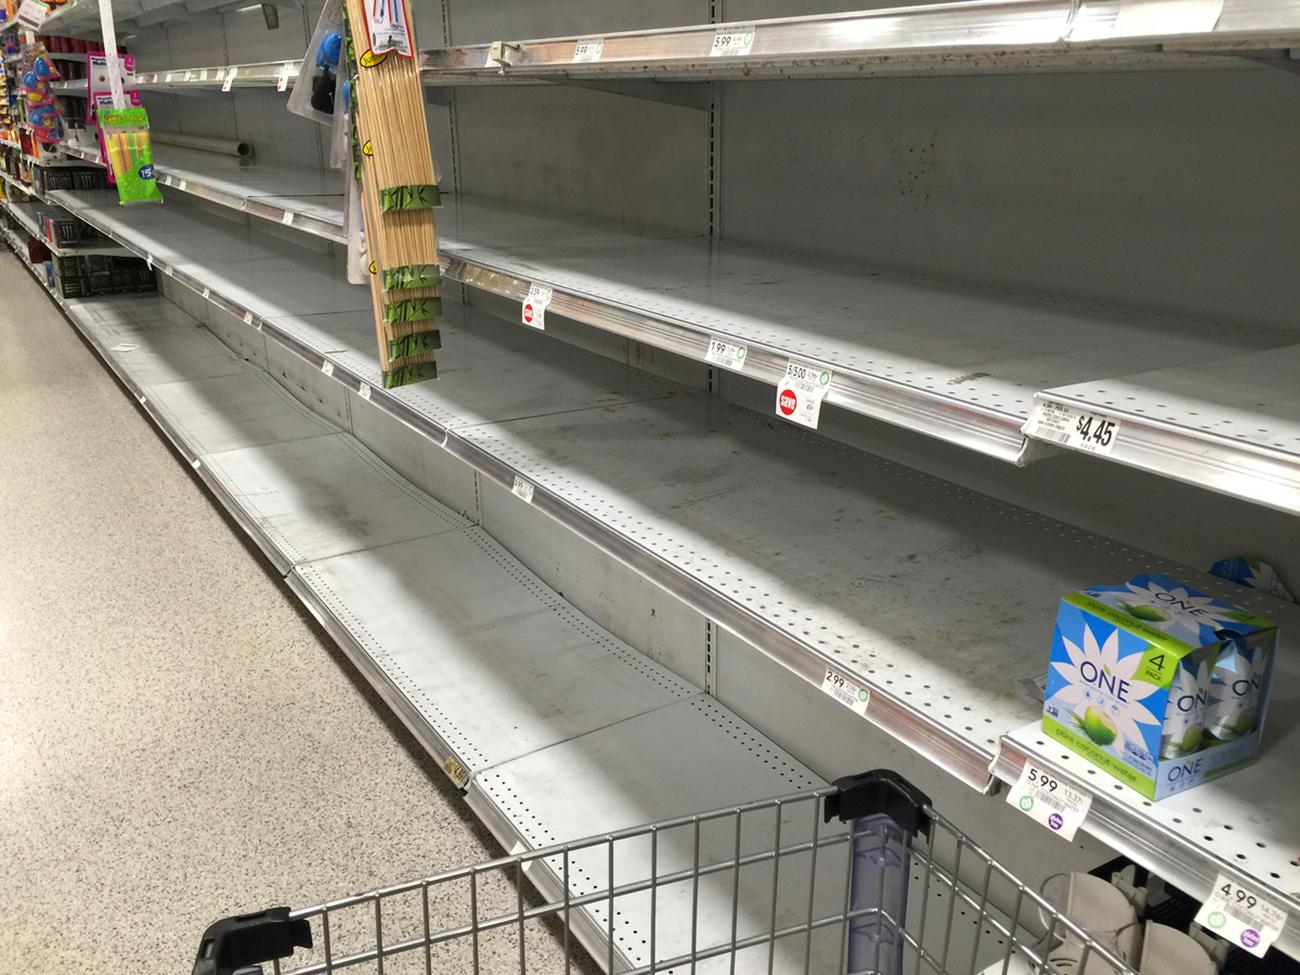 Foto4 Prateleiras vazias 1 NJ proíbe retorno de mantimentos comprados durante surto de coronavírus